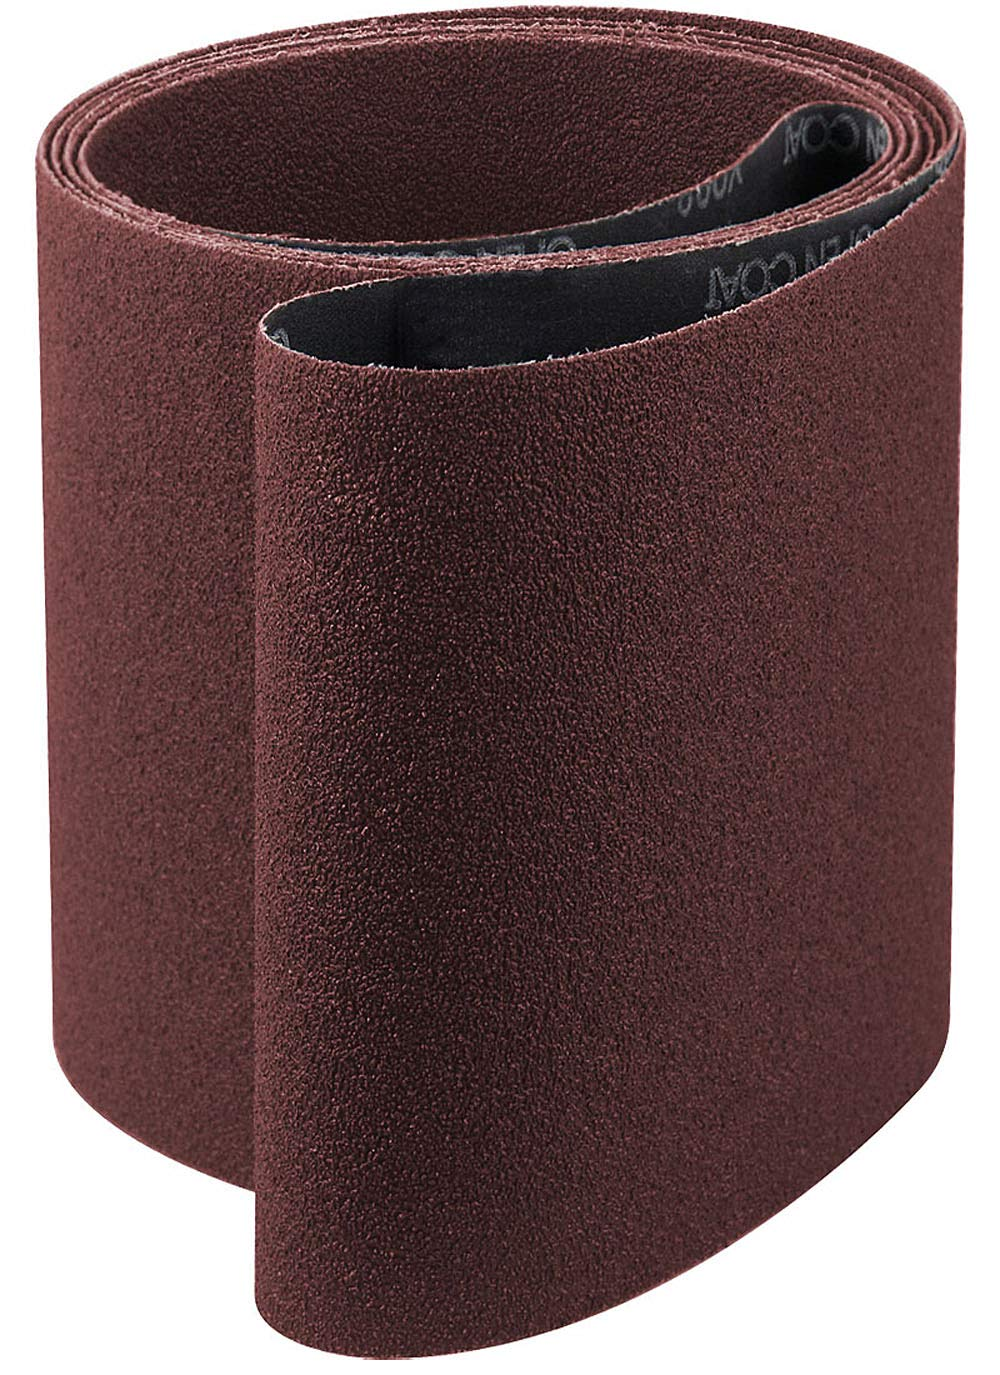 6x108 Aluminum Oxide 80 Grit Sander Belt, x-weight<br>A&H Abrasives 925662x5, 5-pack